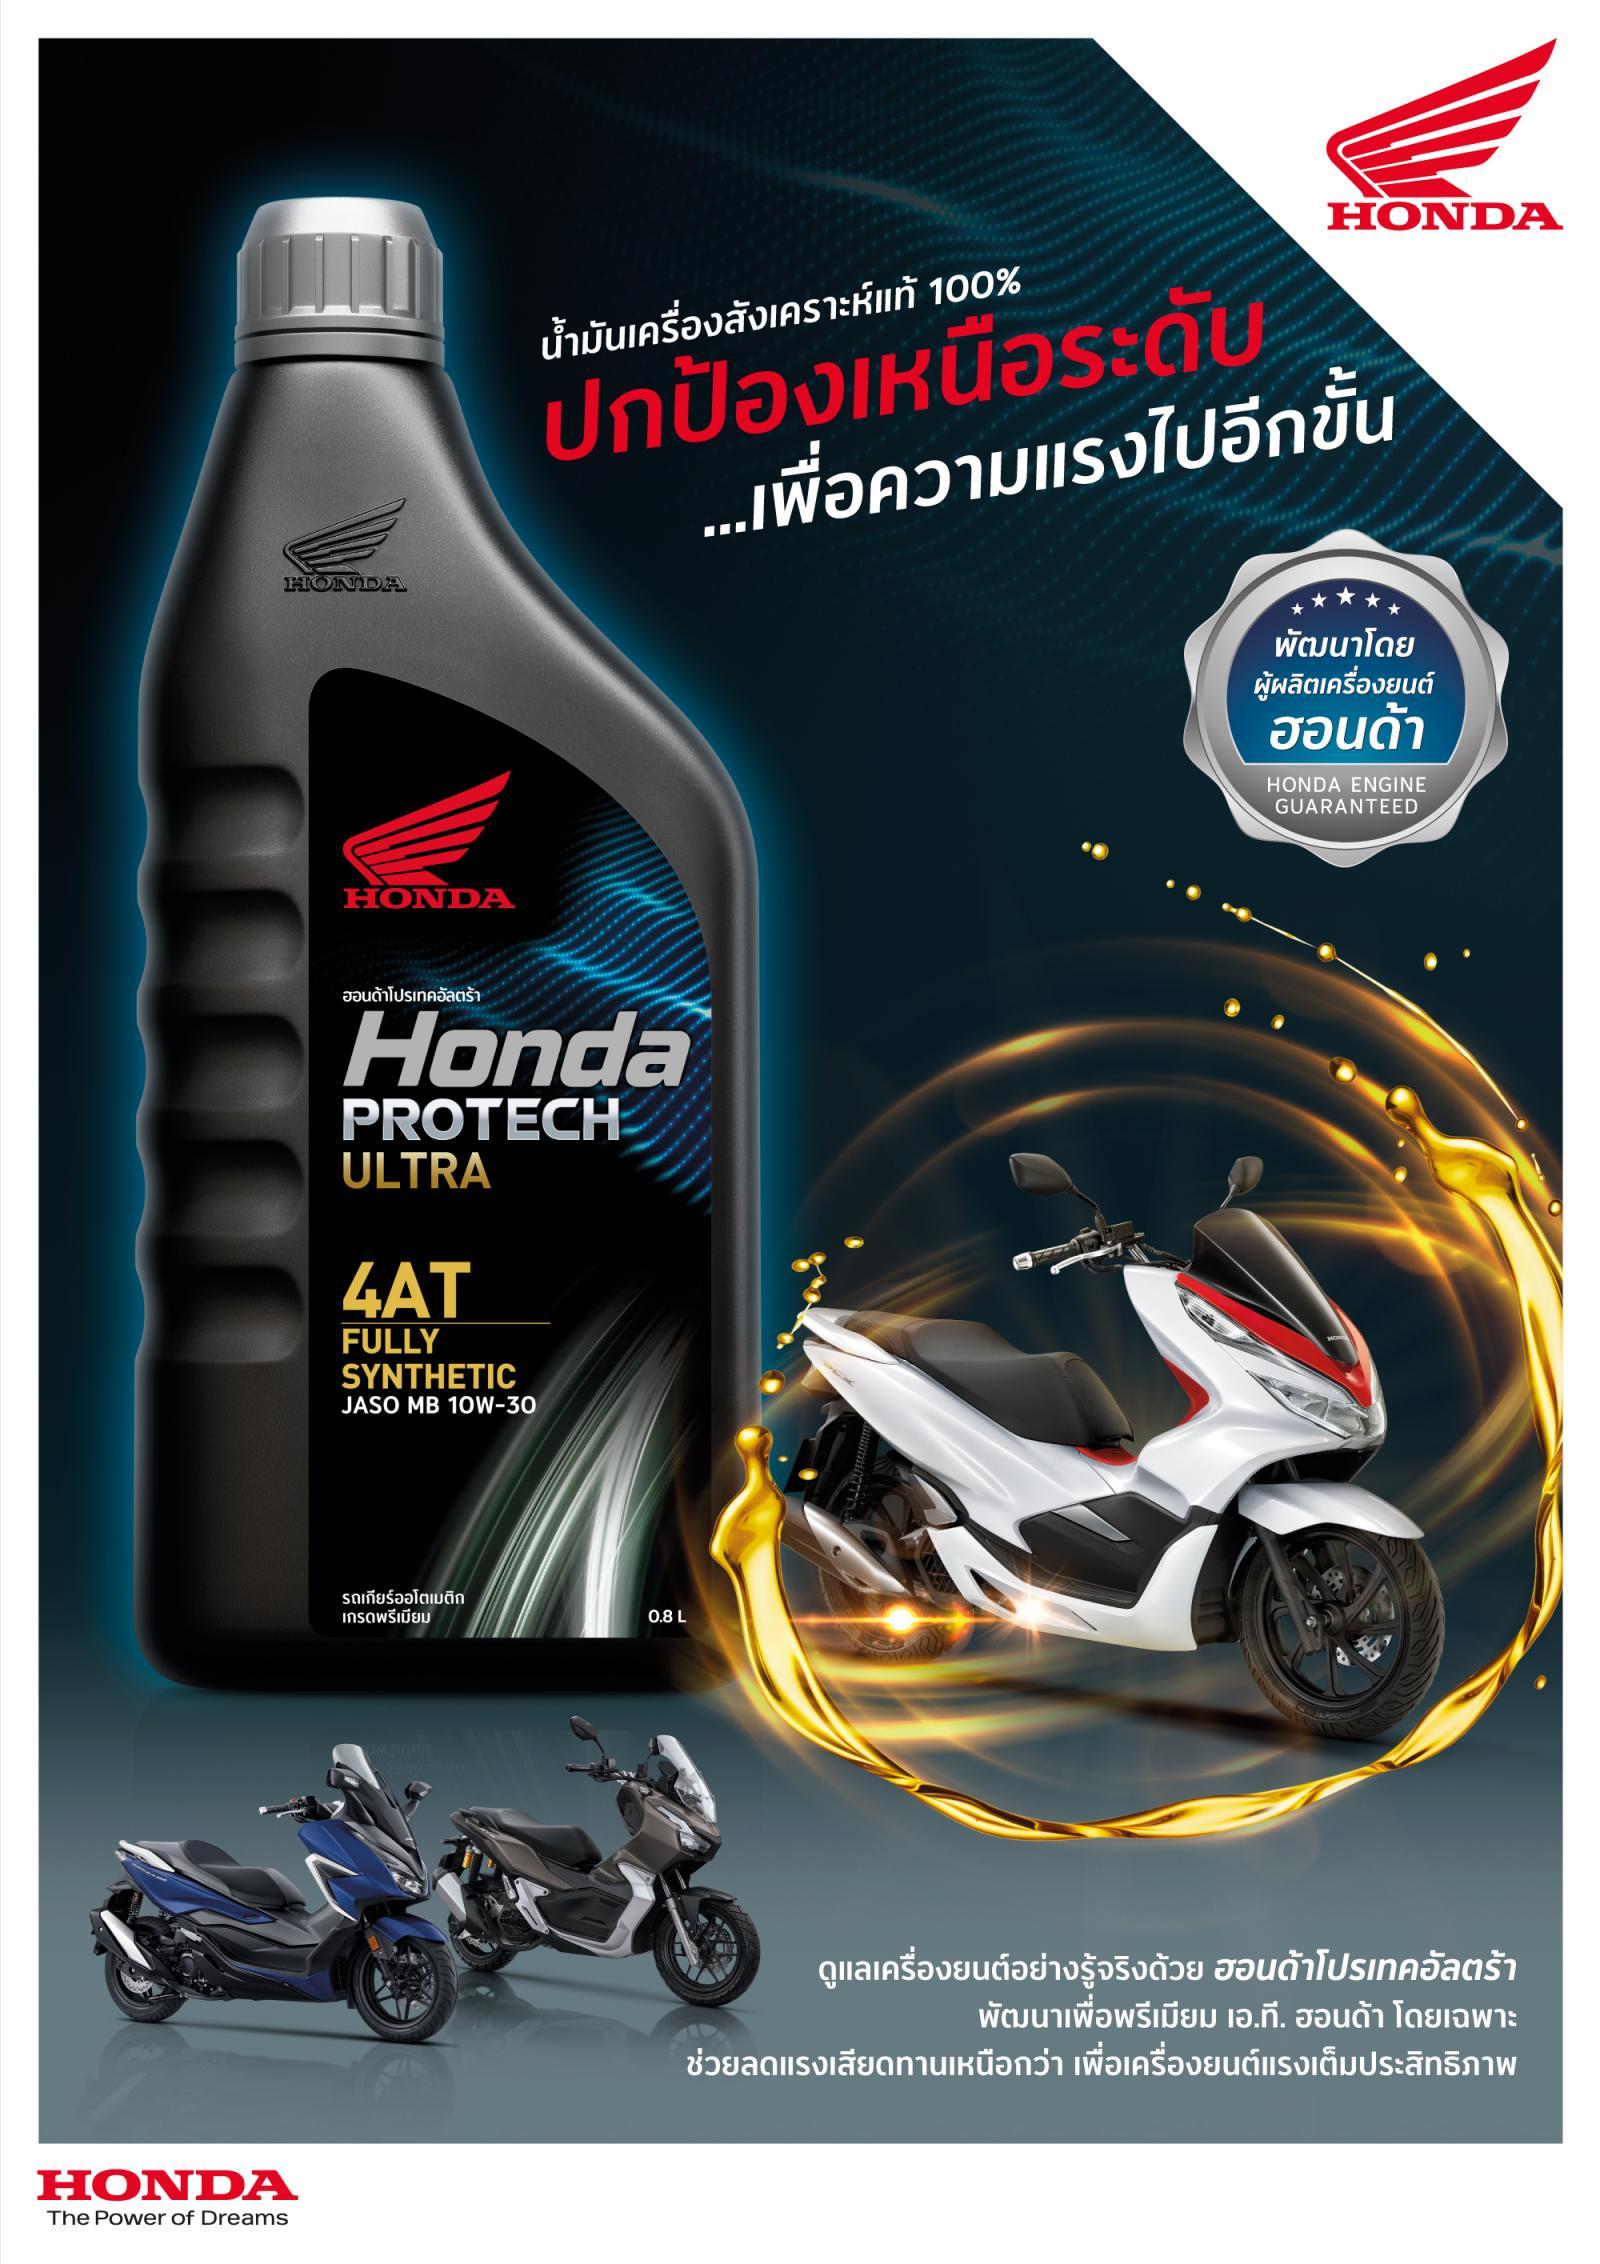 Honda Protech Ultra 4AT Fully Synthetic